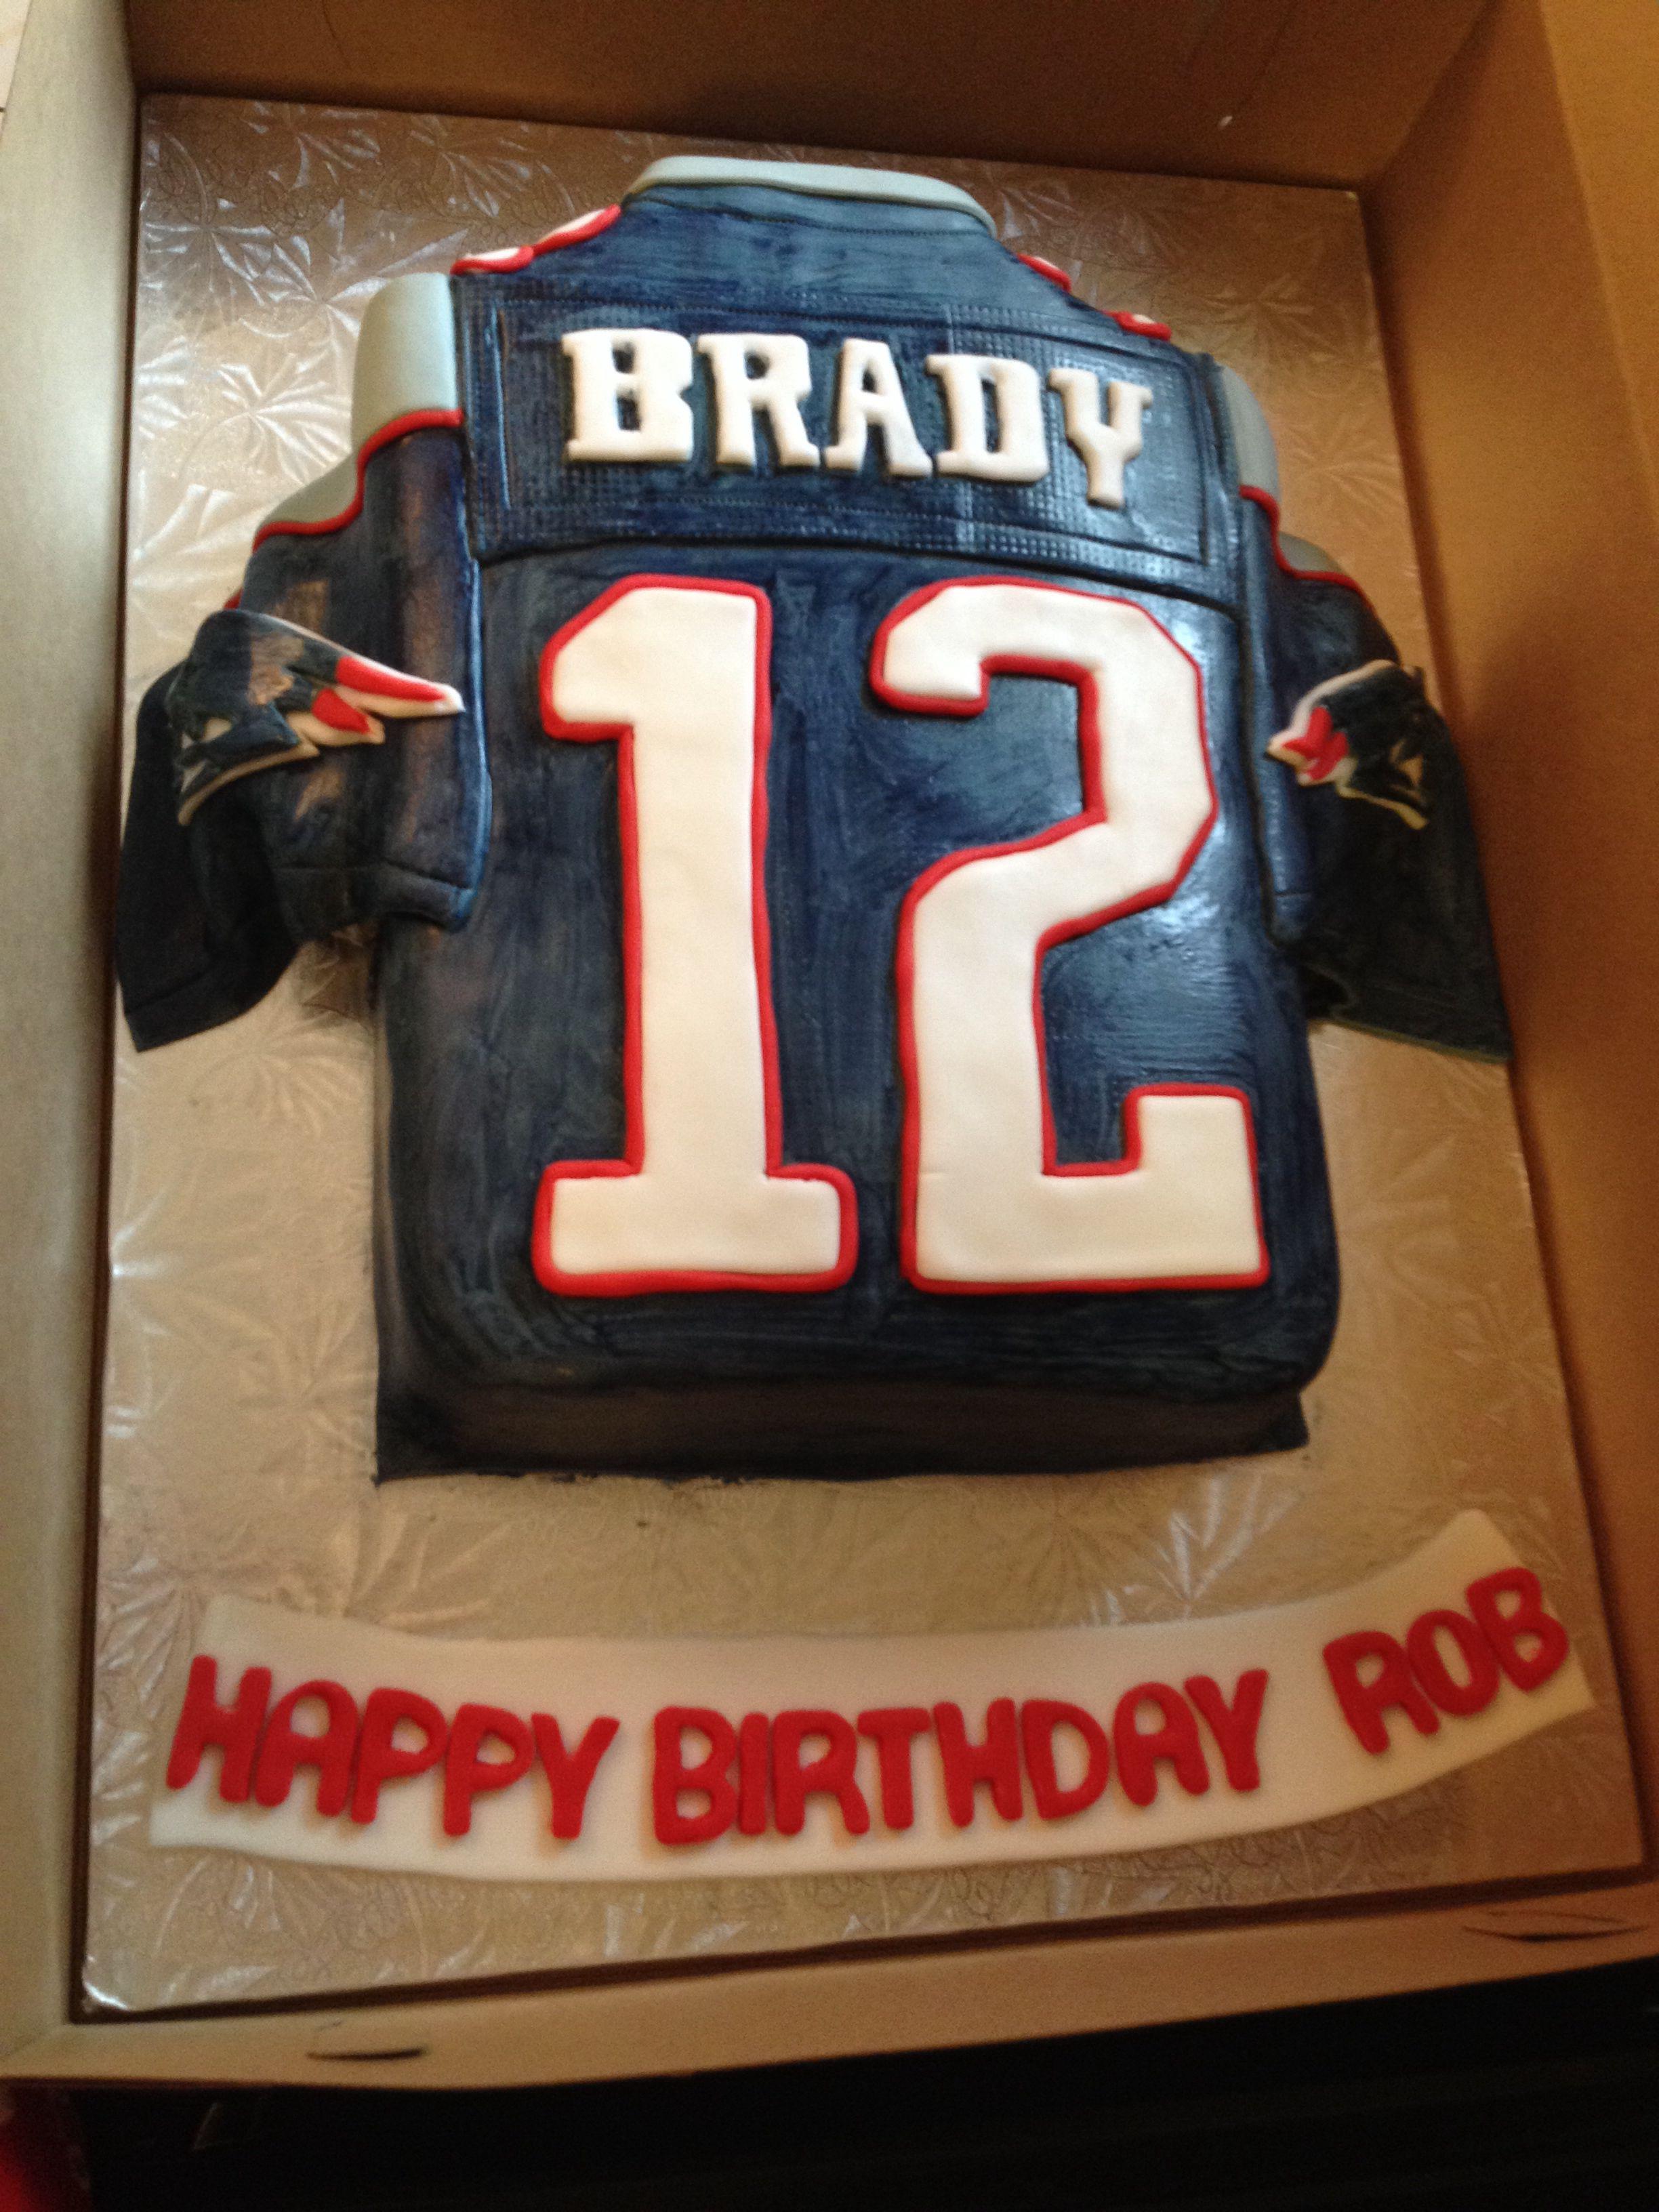 Groovy New England Patriots Jersey Cake Vanilla For 35Th Birthday Funny Birthday Cards Online Elaedamsfinfo